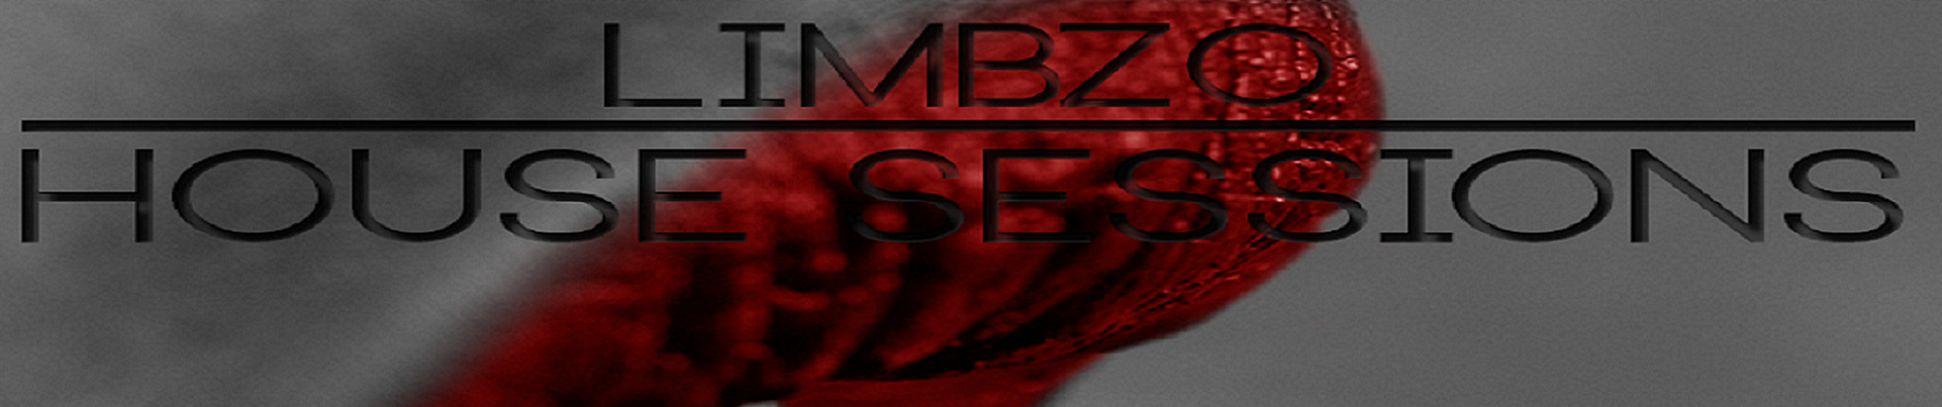 limbzo house session 6.0